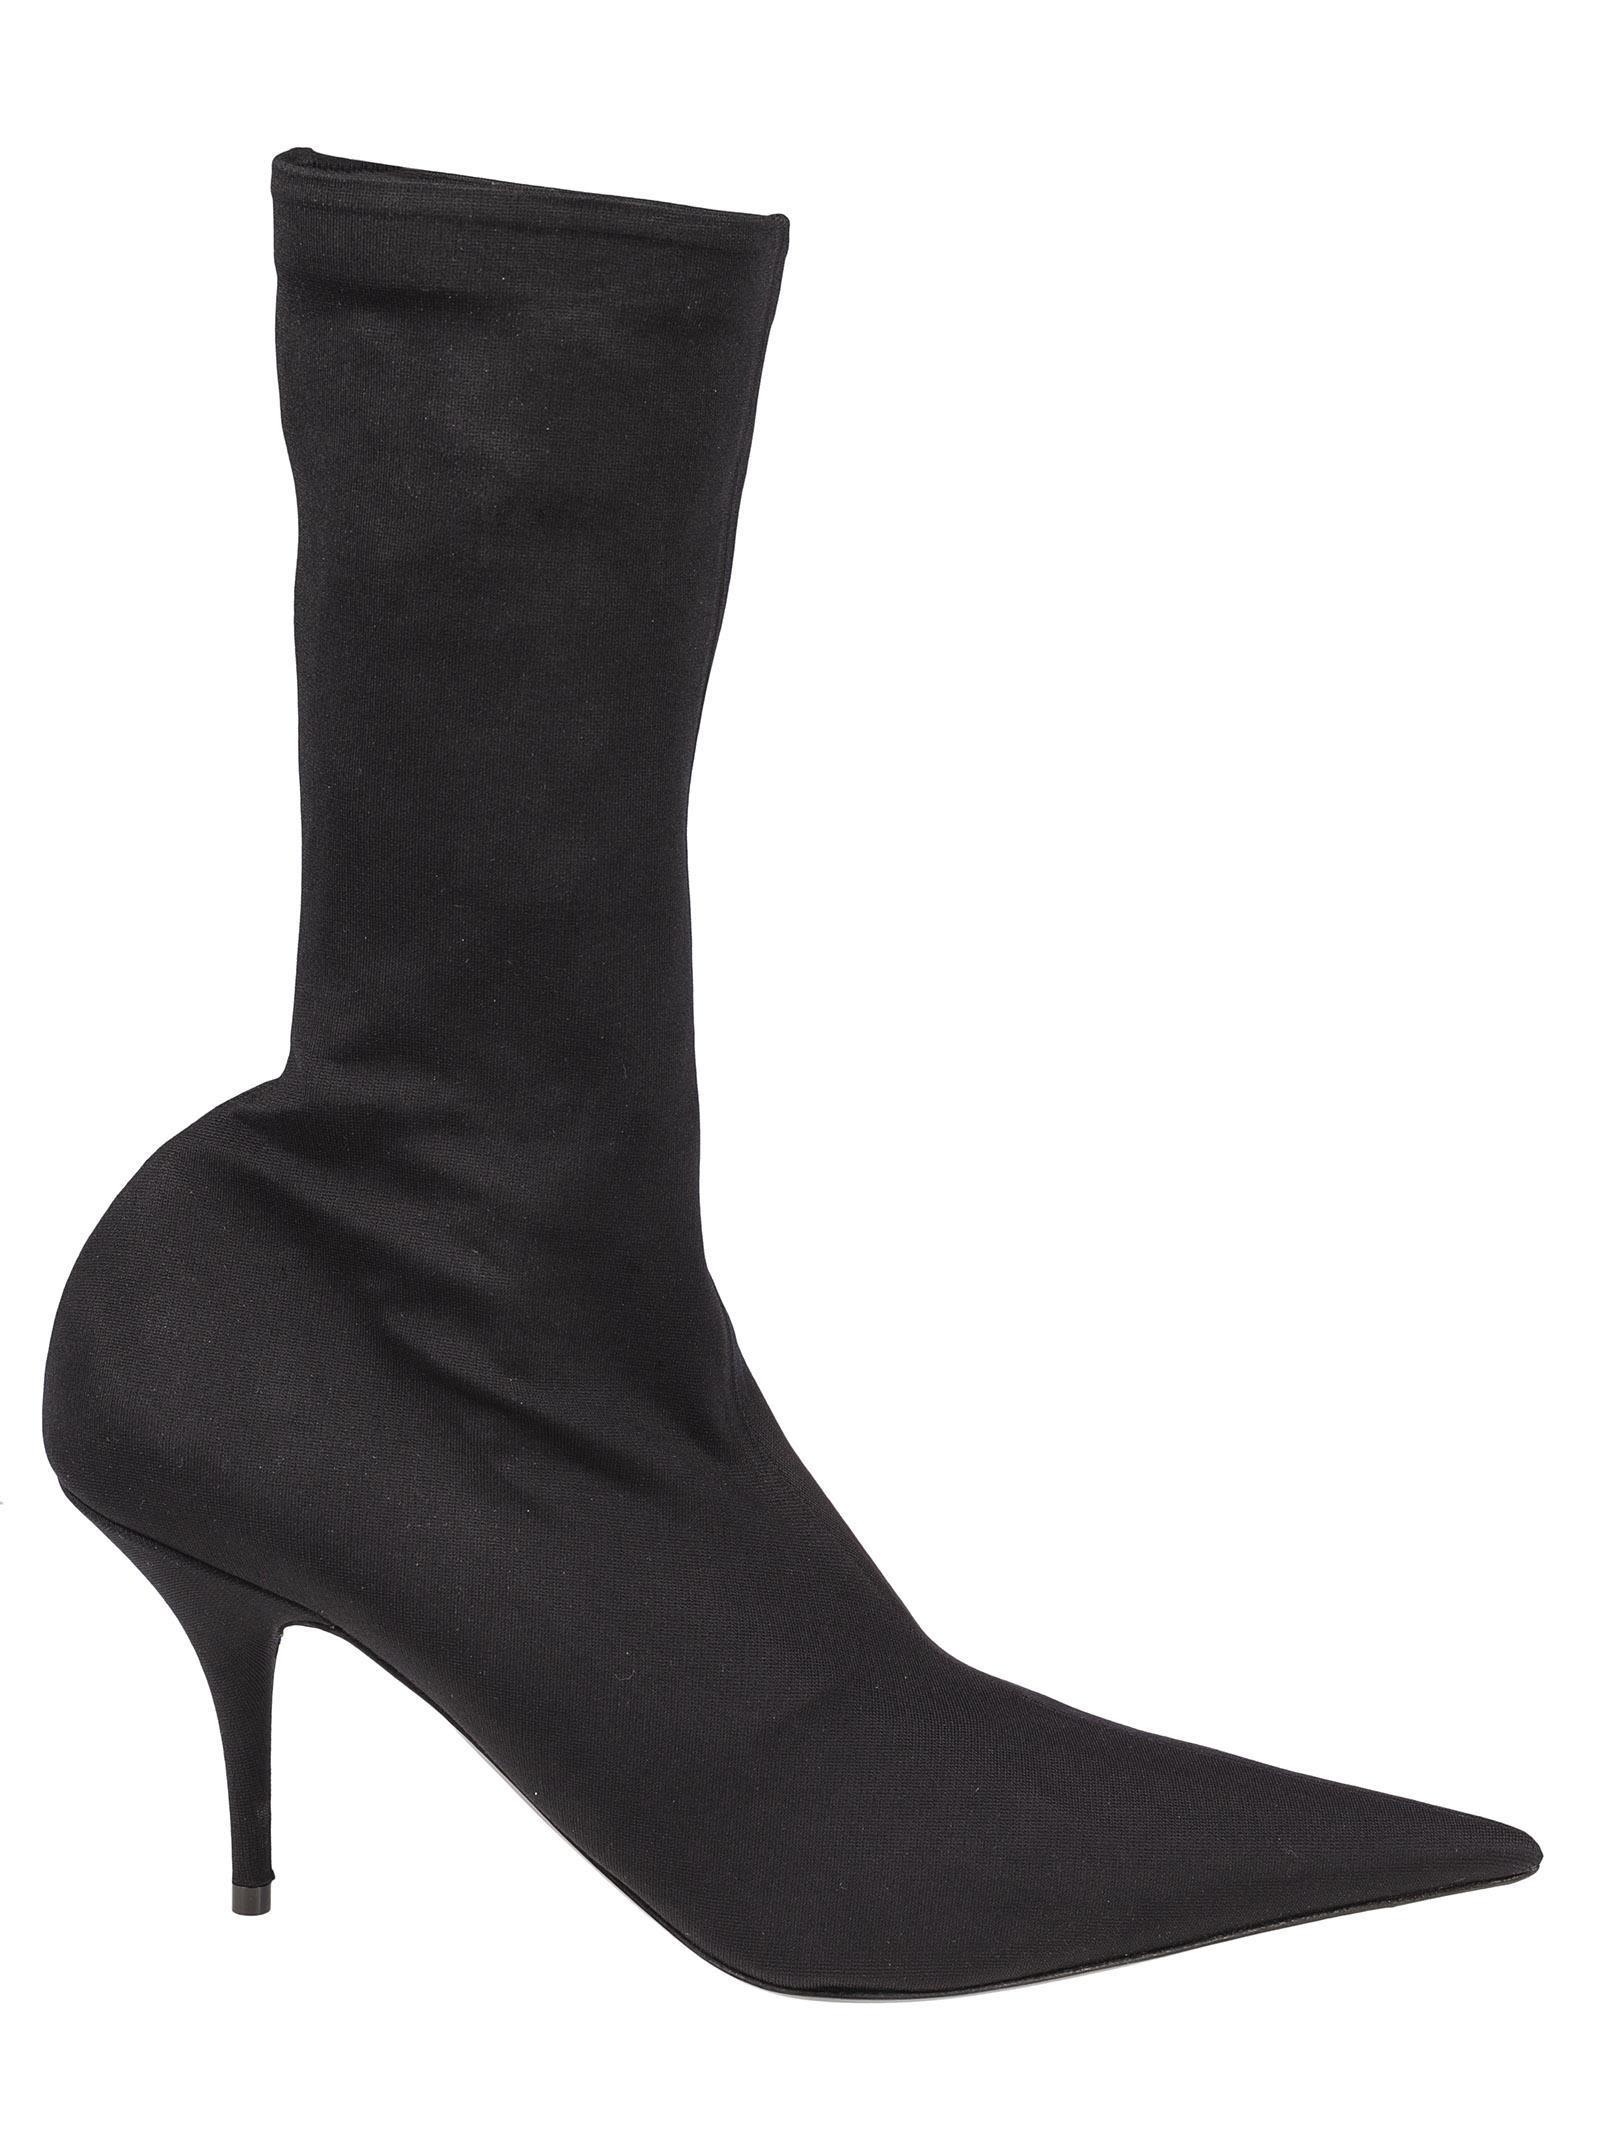 b5d11523f6e9 Balenciaga Ladies Black Knife 110 Spandex Heeled Ankle Boots